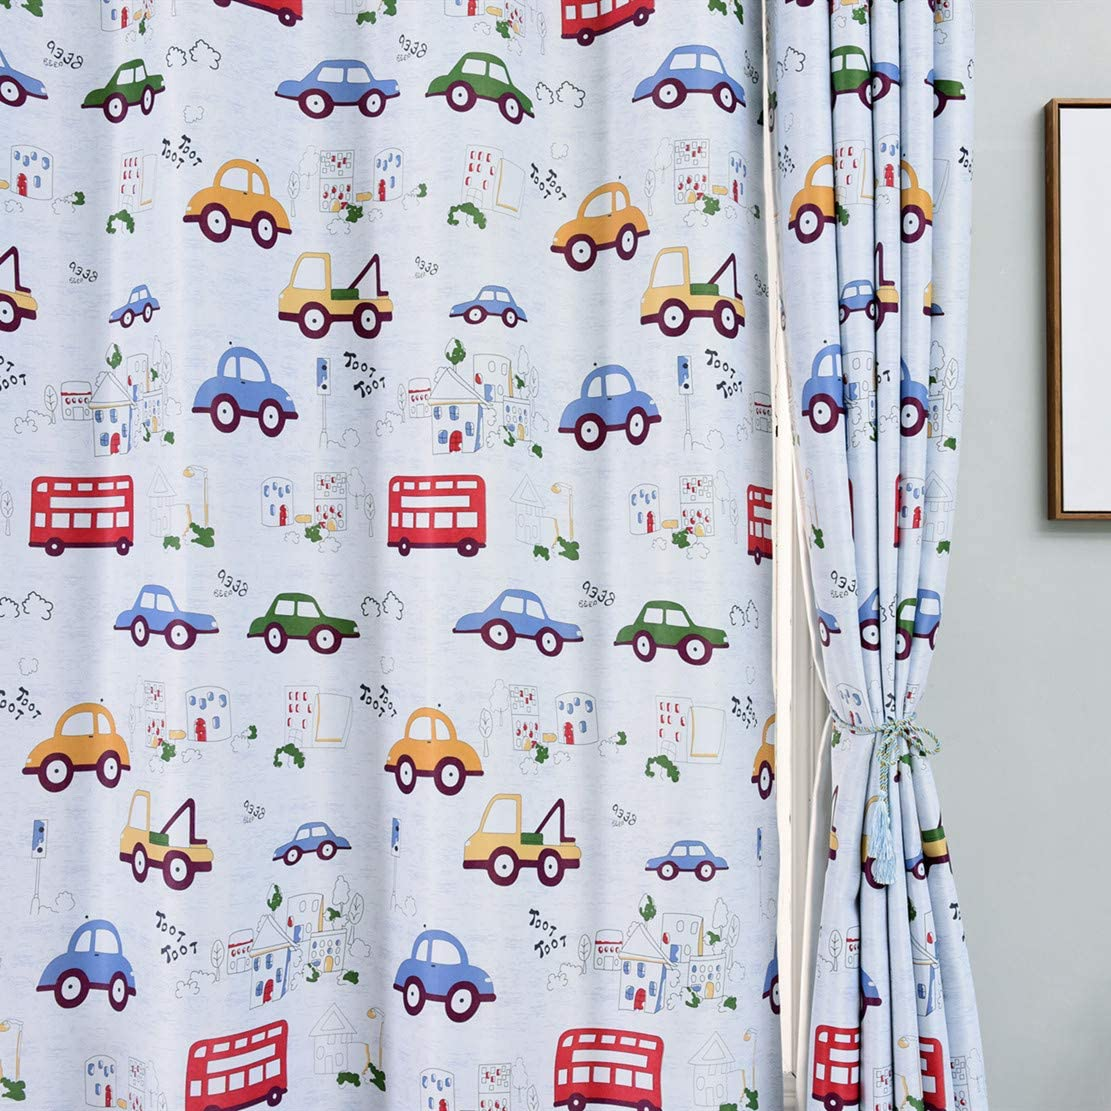 MYRU 2 Panels Set Cars Cartoon Curtains 63 Inch Length Semi Blackout Curtains for Kids Room 2 x 39 x 63 Inch, Cartoon Cars